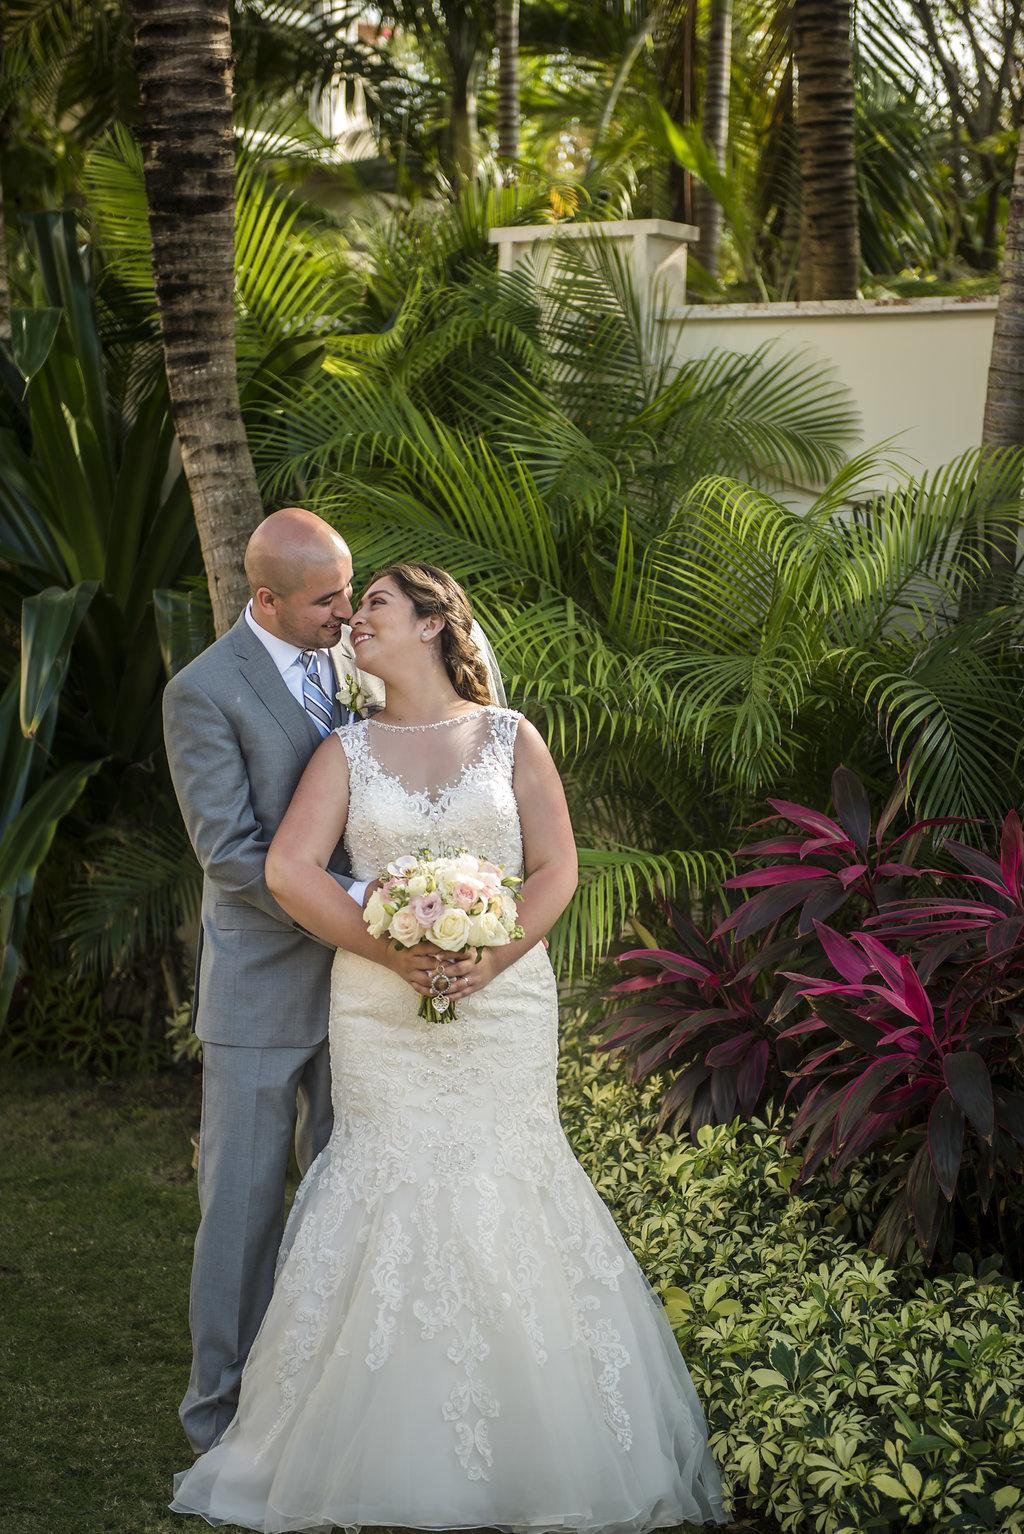 yesica-jose-beach-wedding-Villa-La-Joya--Playa-del-carmen-01--19.jpg